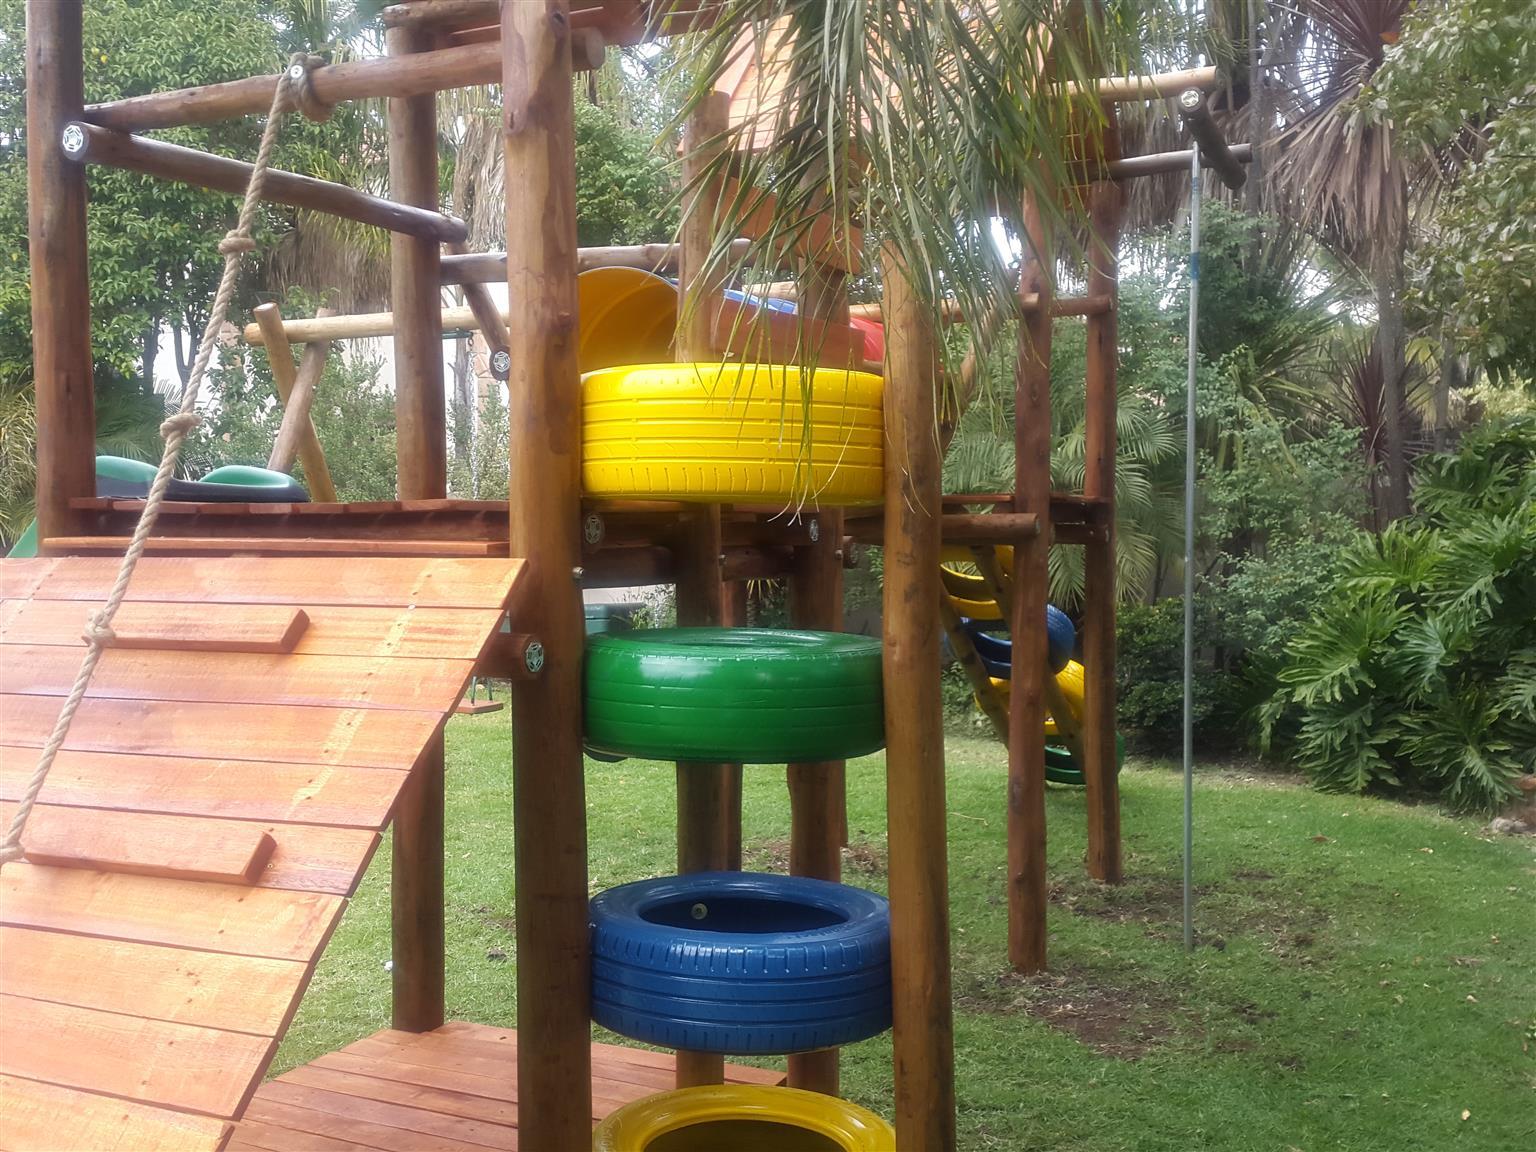 New jungle gym R11 400 free installation ex del